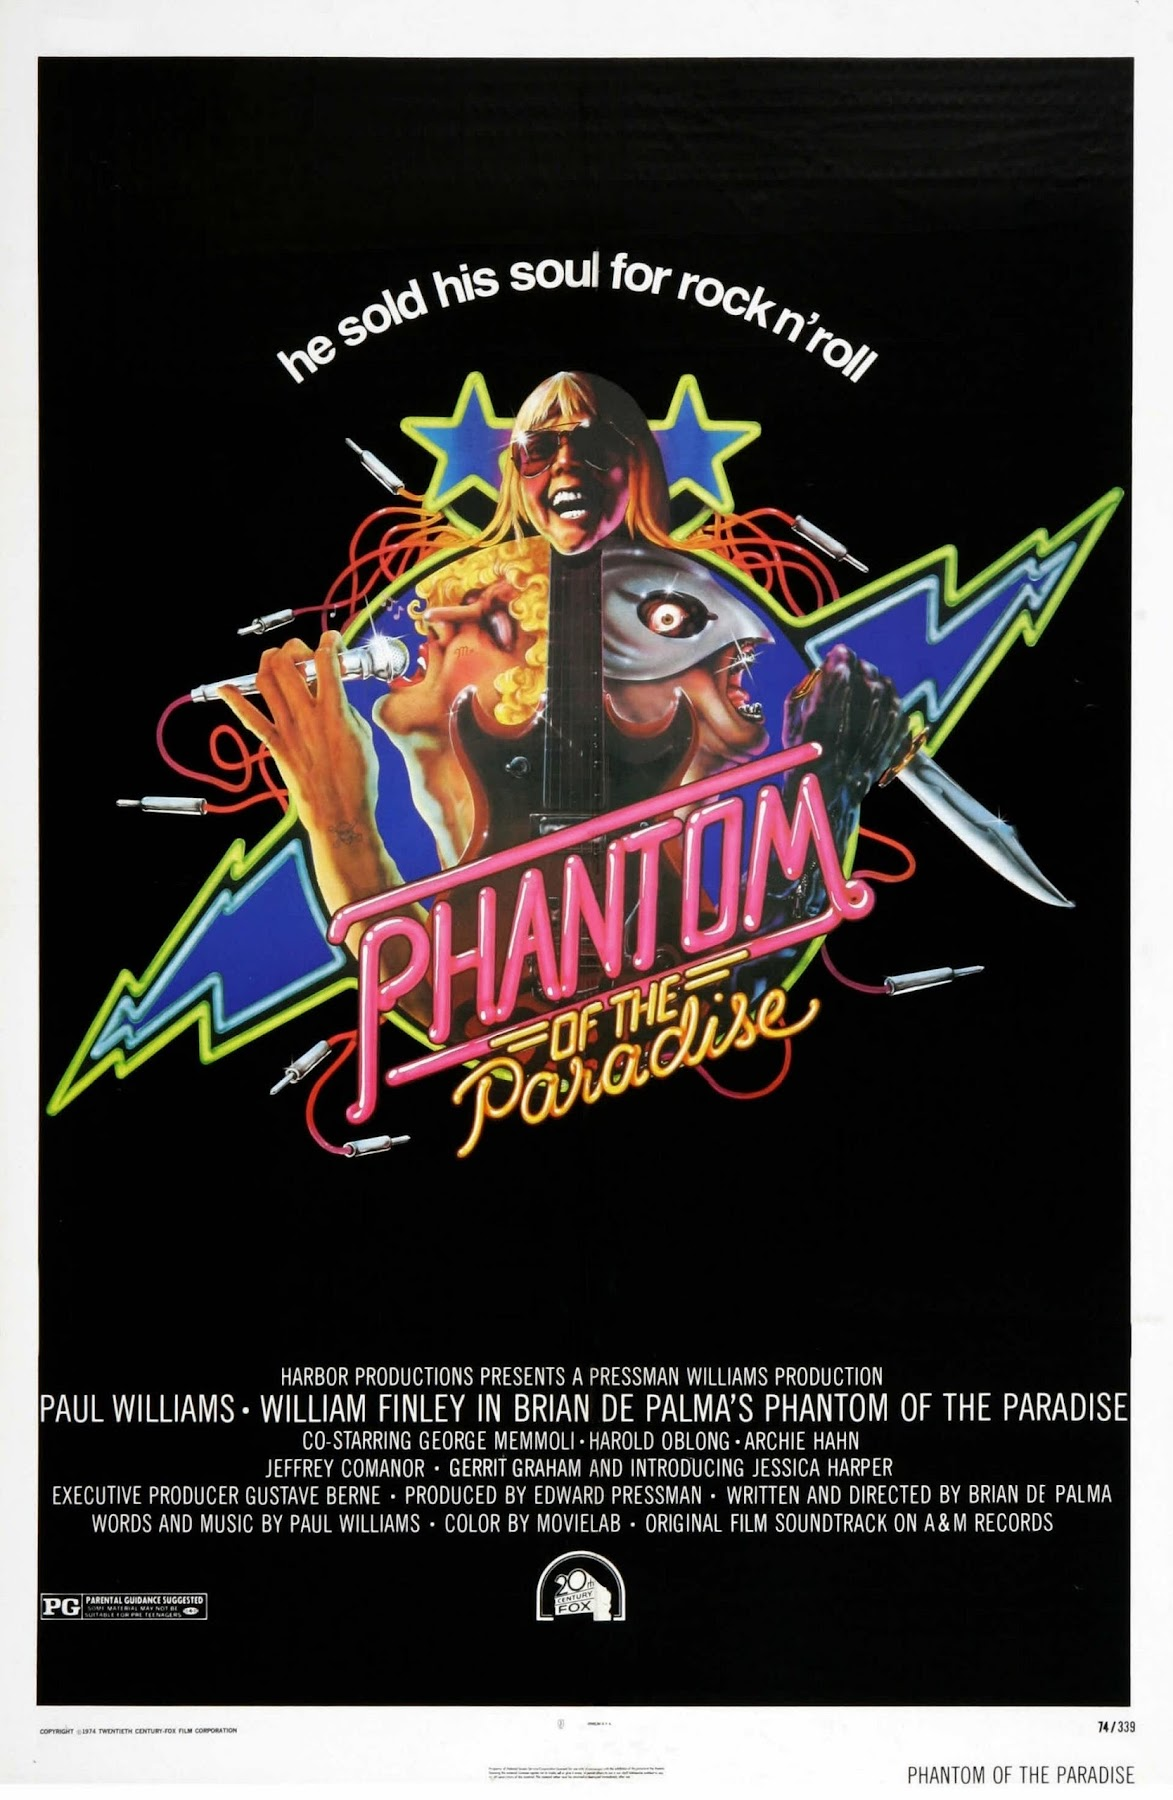 http://3.bp.blogspot.com/-9N9KEmCzkdw/TdWtnEuU9oI/AAAAAAAAKmY/ElDlVpY0WZI/s1800/phantom-of-the-paradise-original.jpg